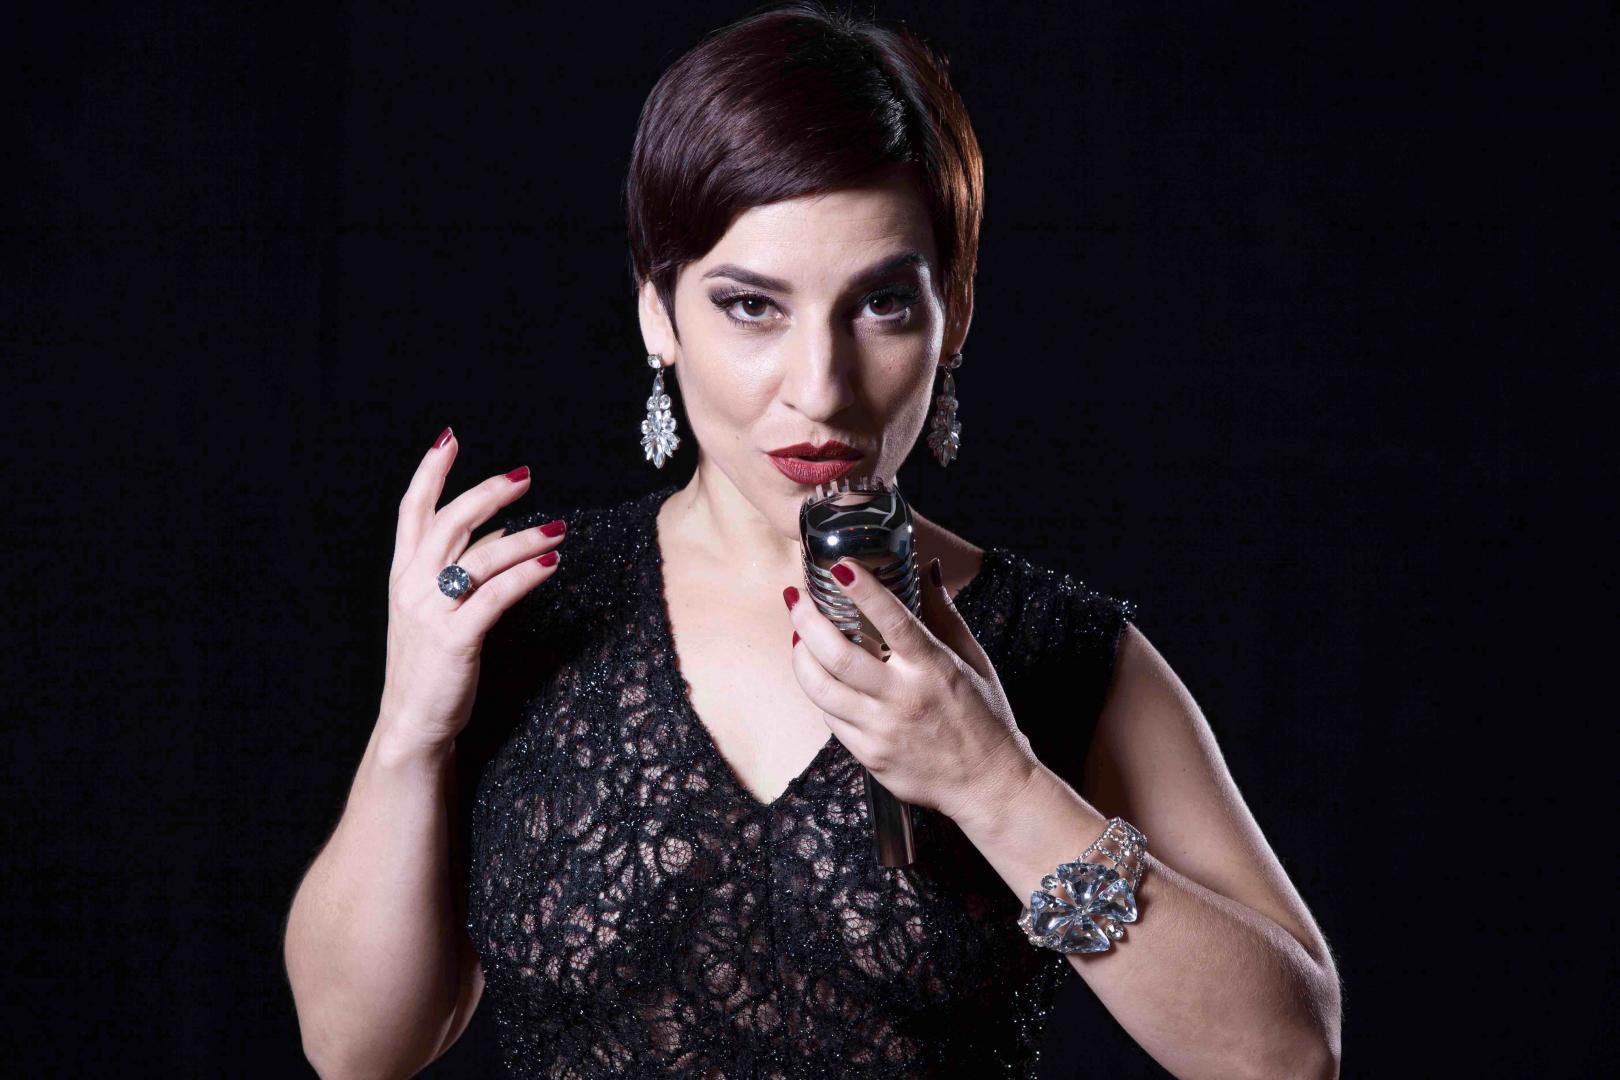 Simone Gutierrez estreia tributo a Liza Minelli e arquiteta CD e DVD